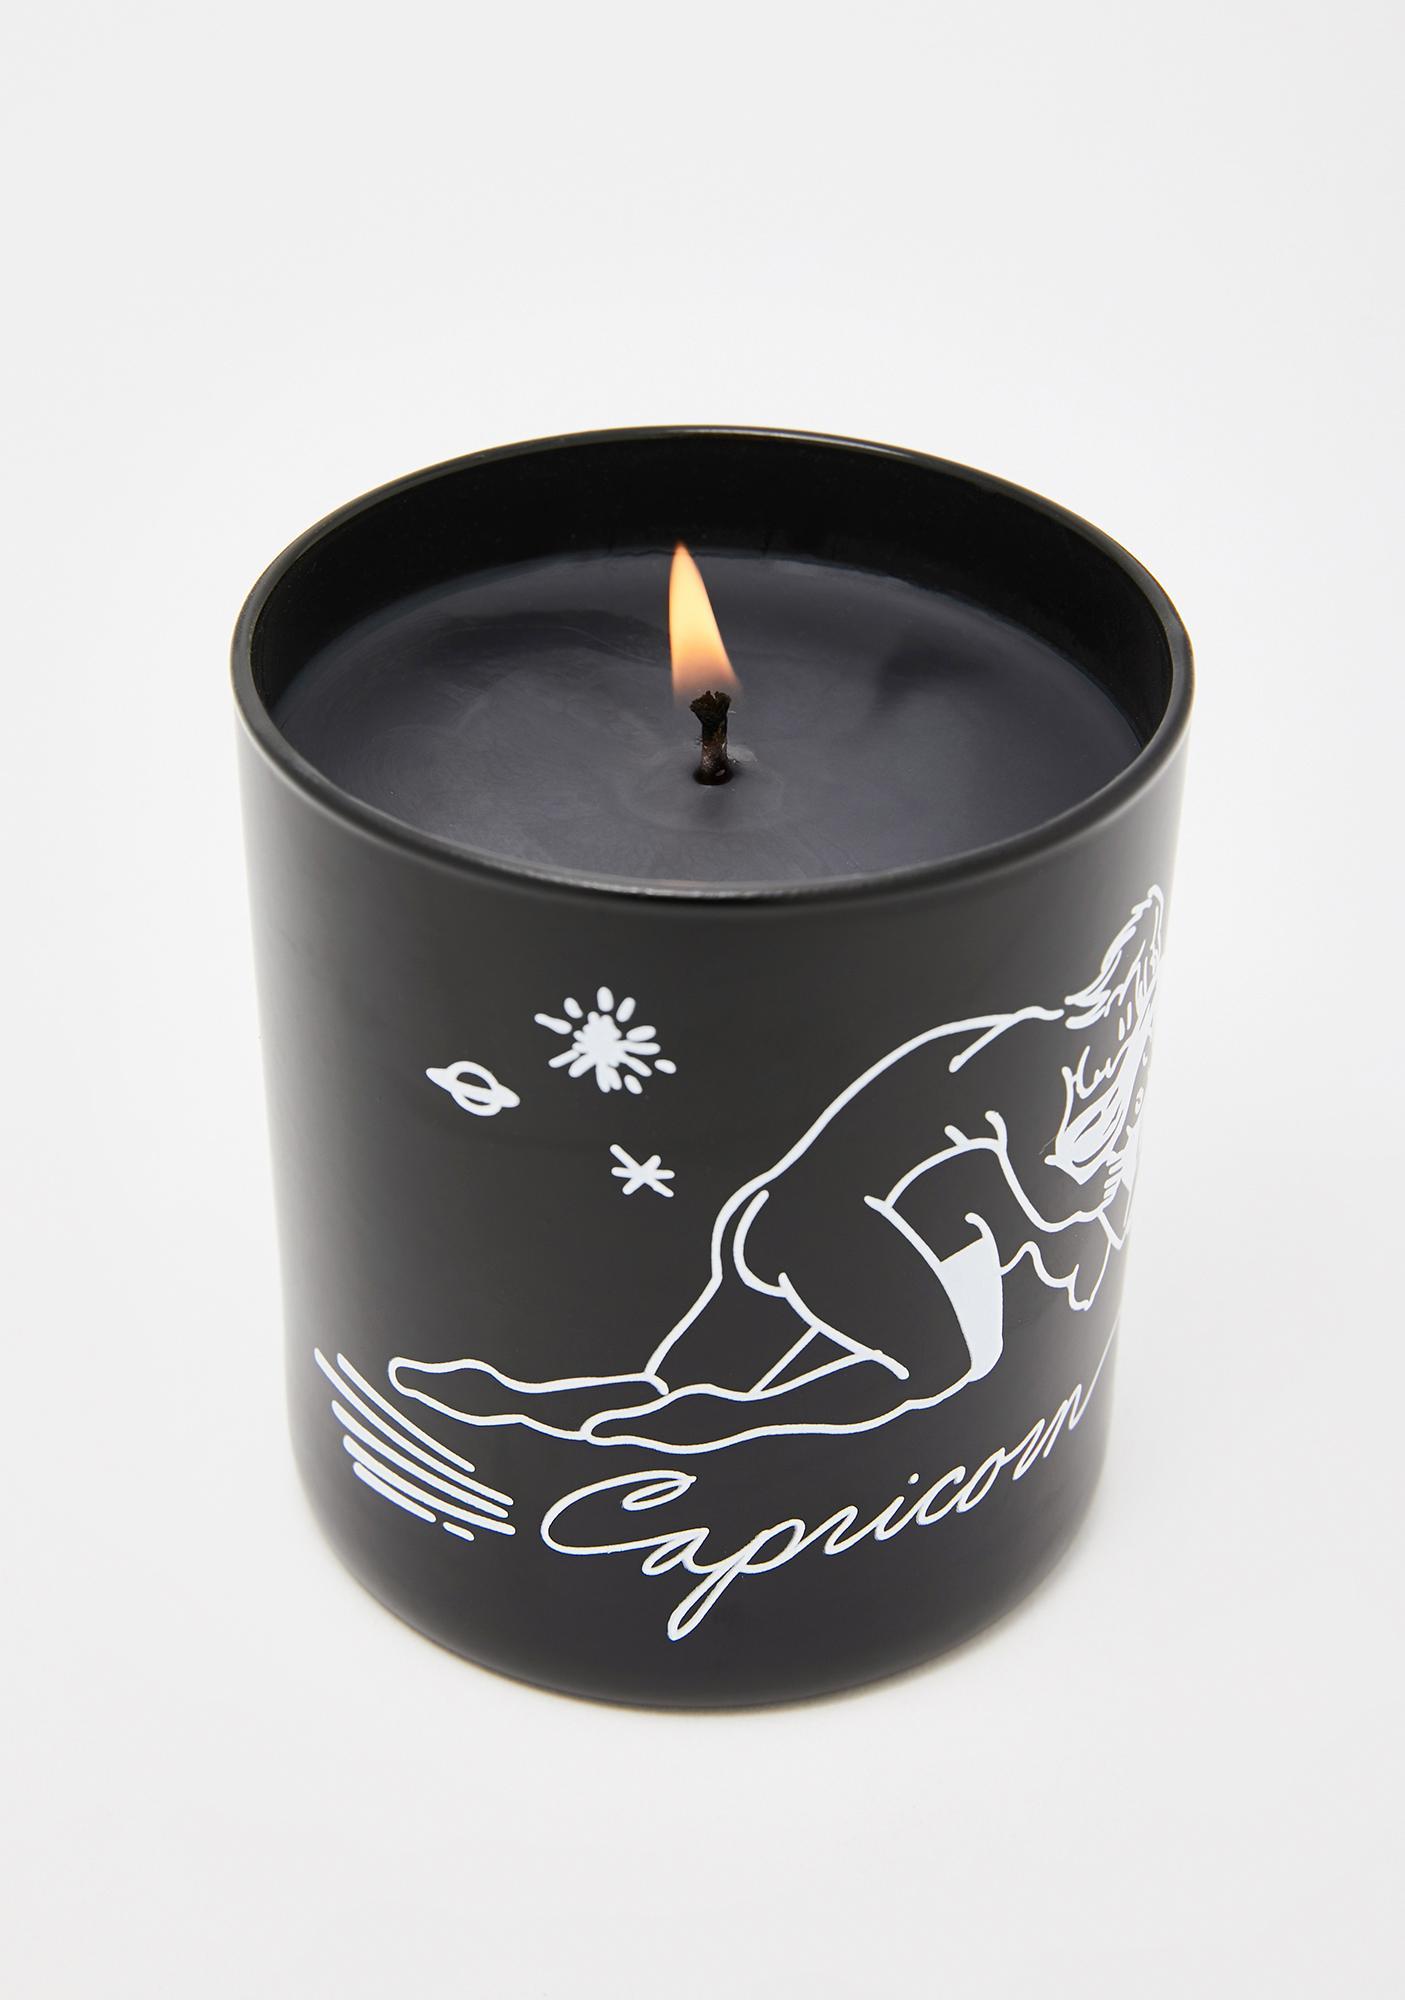 Black Cake Capricorn Zodiac Massage Candle